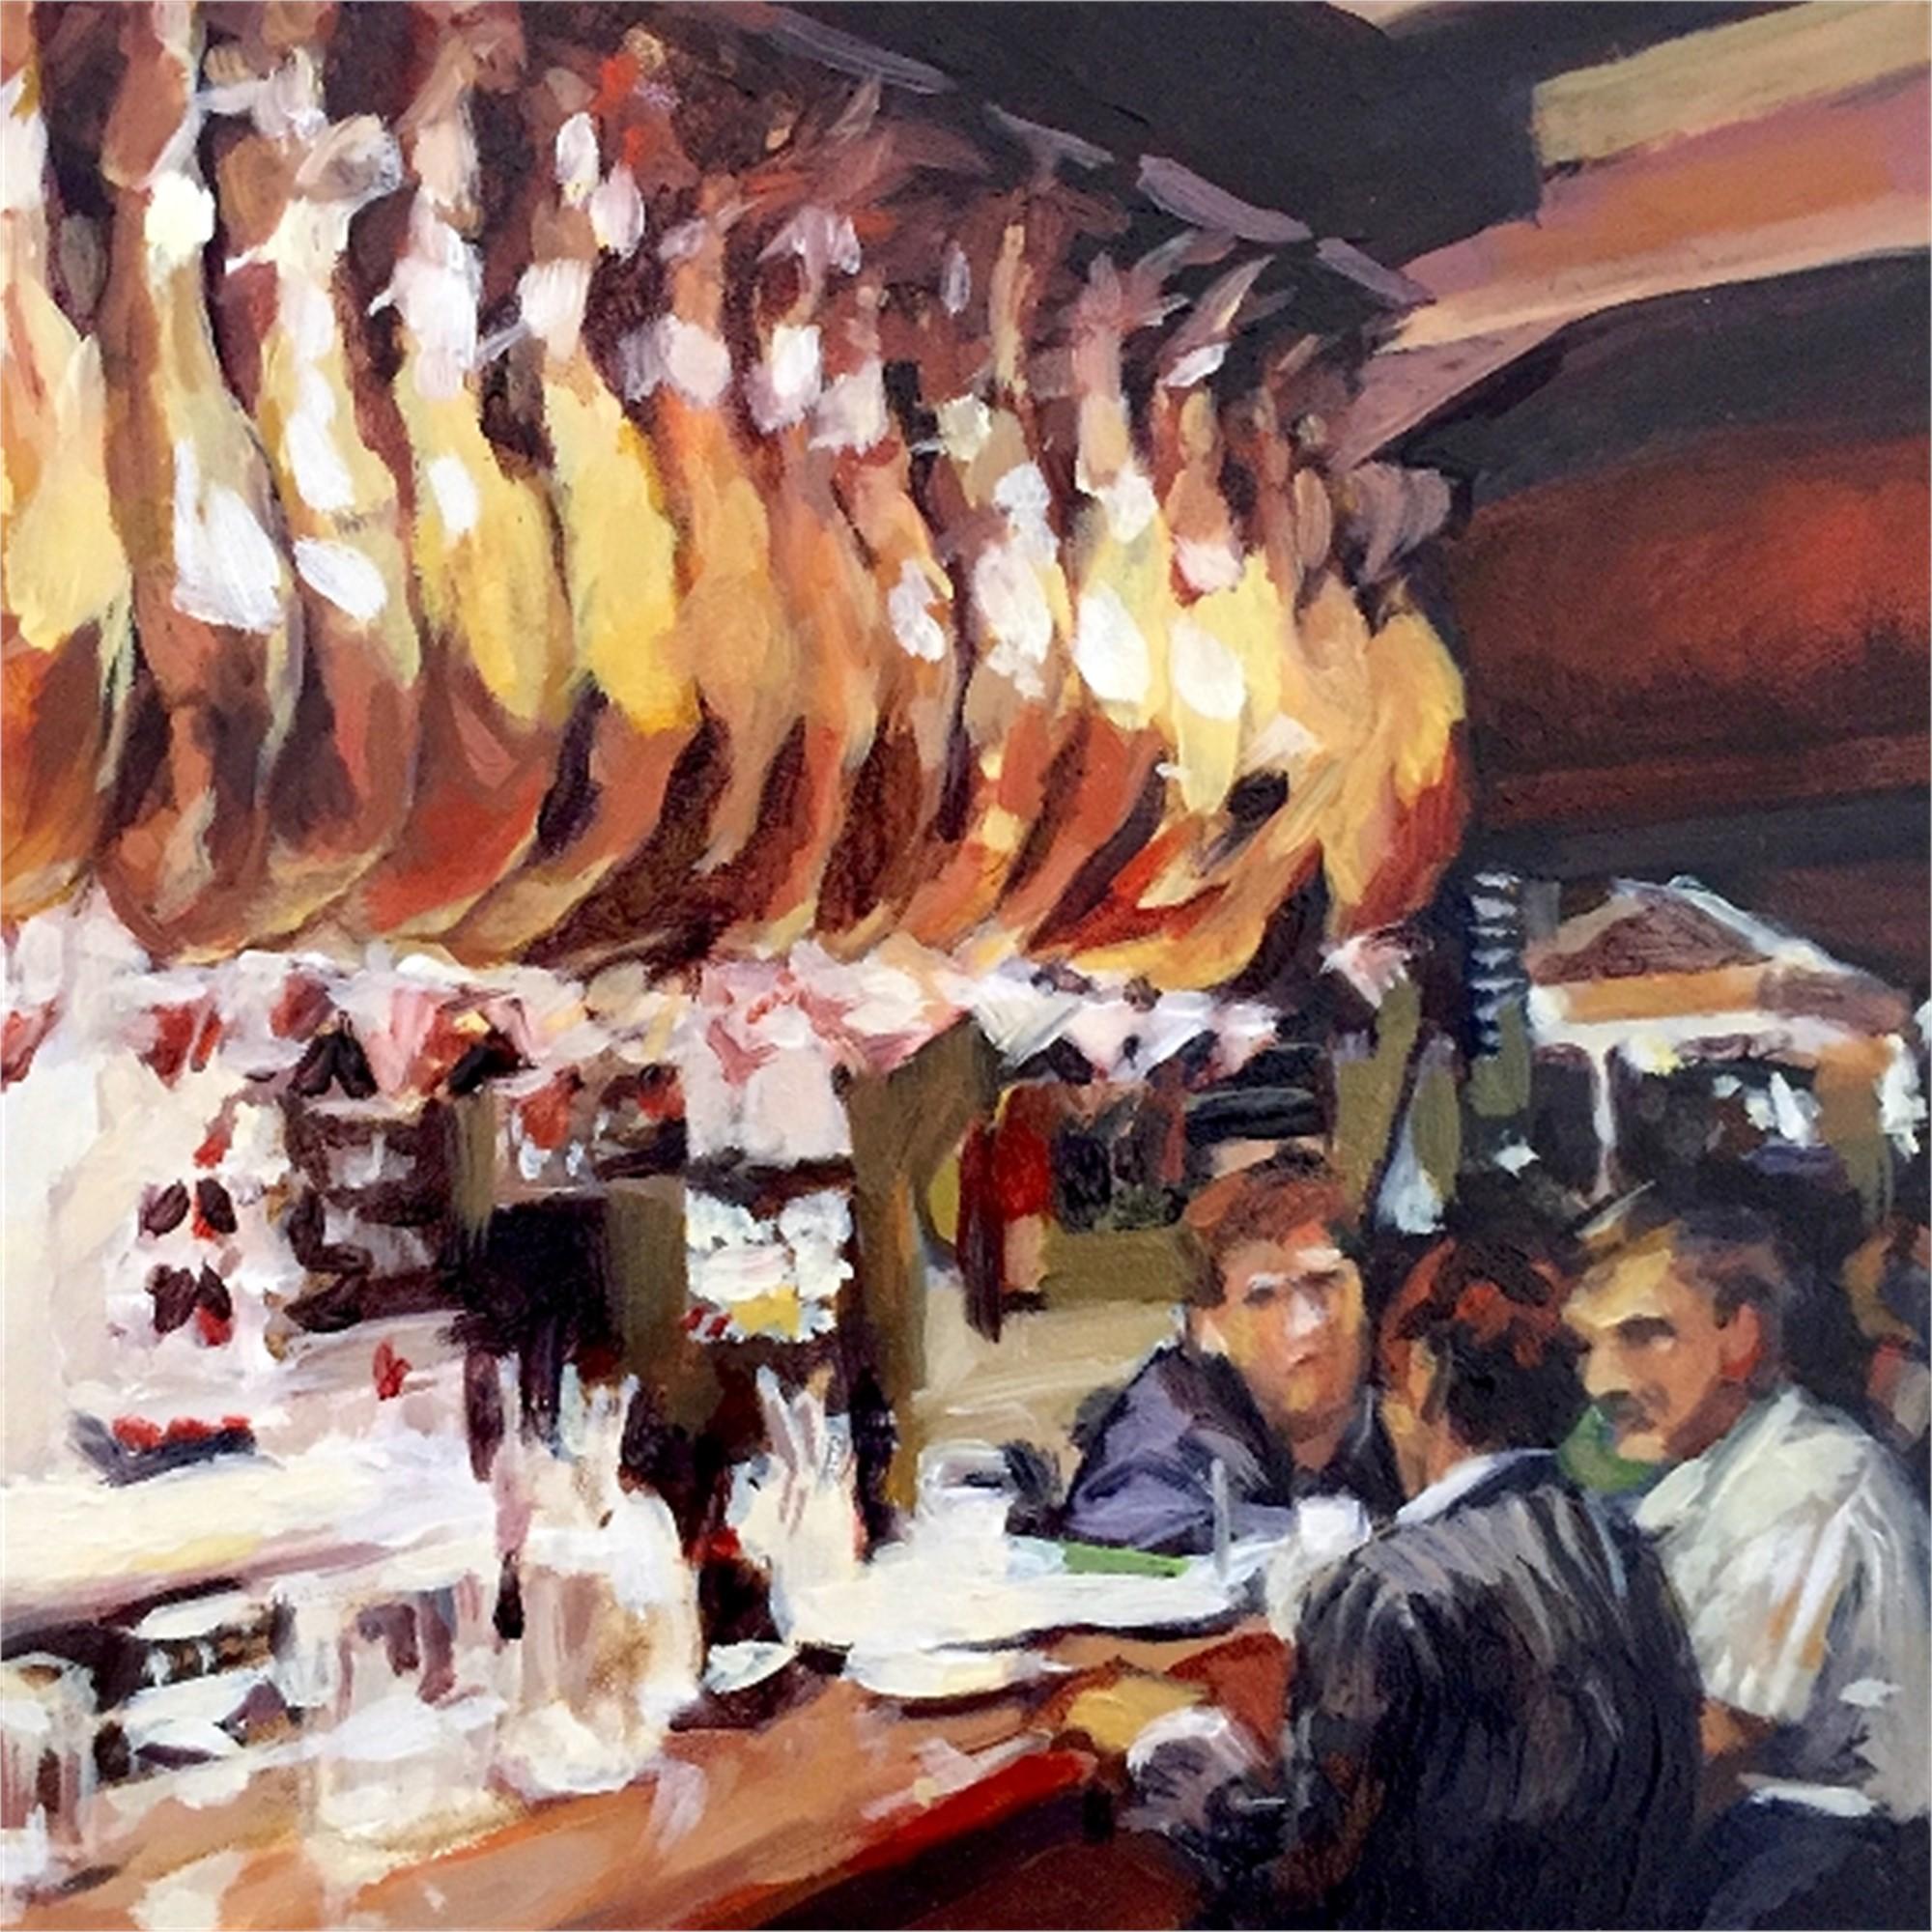 Barcelona Hams by Julie Larick